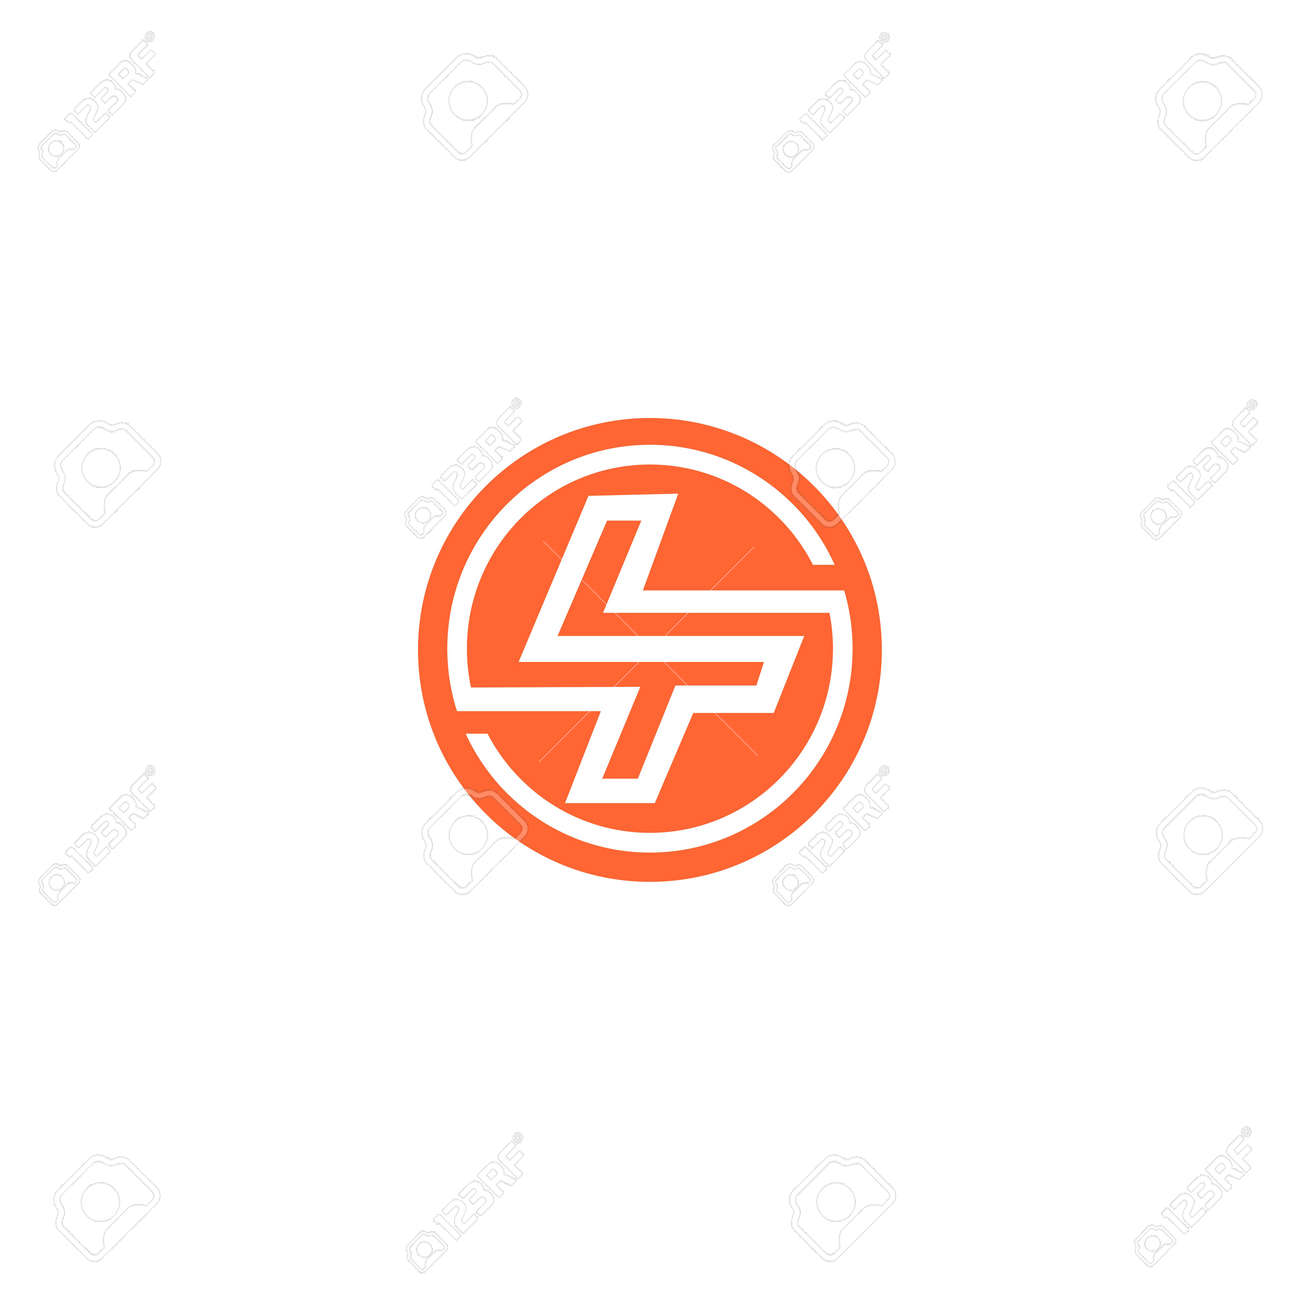 Initial letter lt logo or tl logo vector design template - 154730992